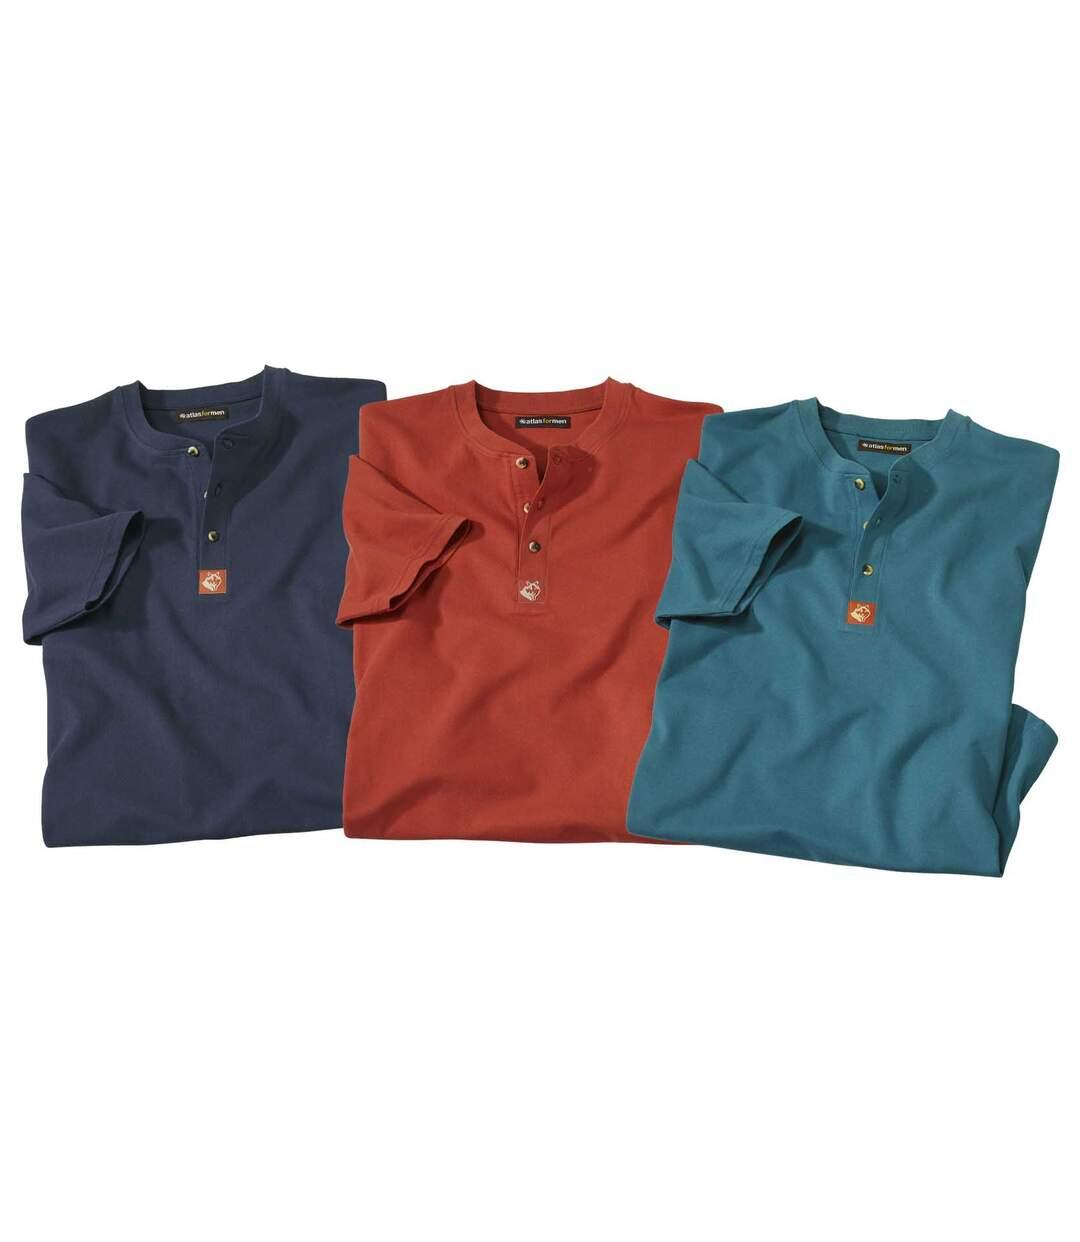 Sada 3 triček Escape sknoflíčkovým zapínáním u krku